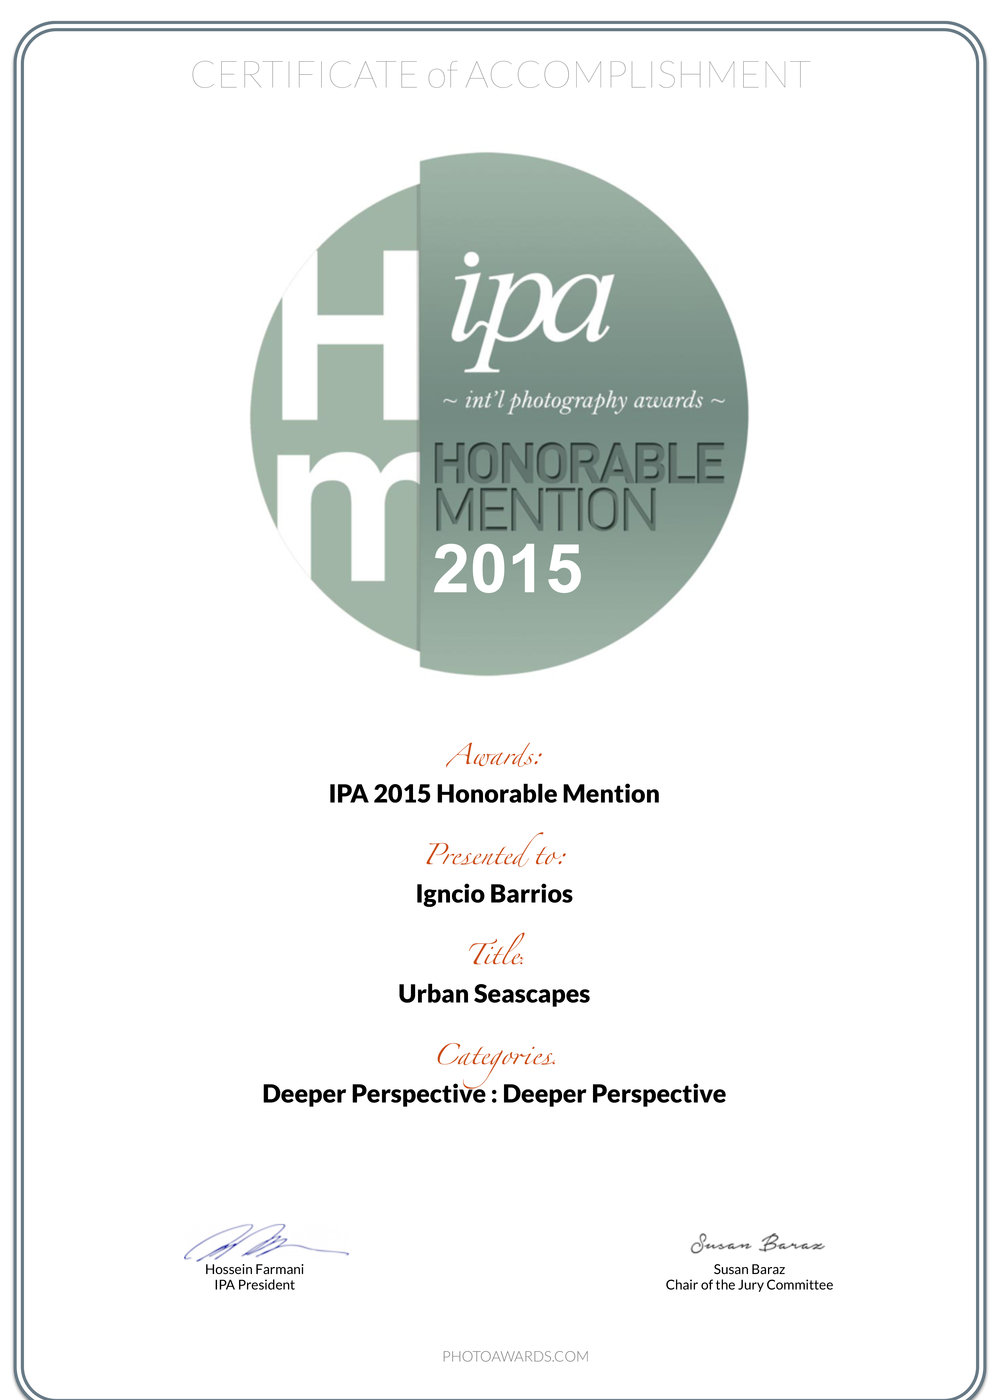 26_ipa-honorable-mentionurbanseascapesdeeperperspective-1.jpg